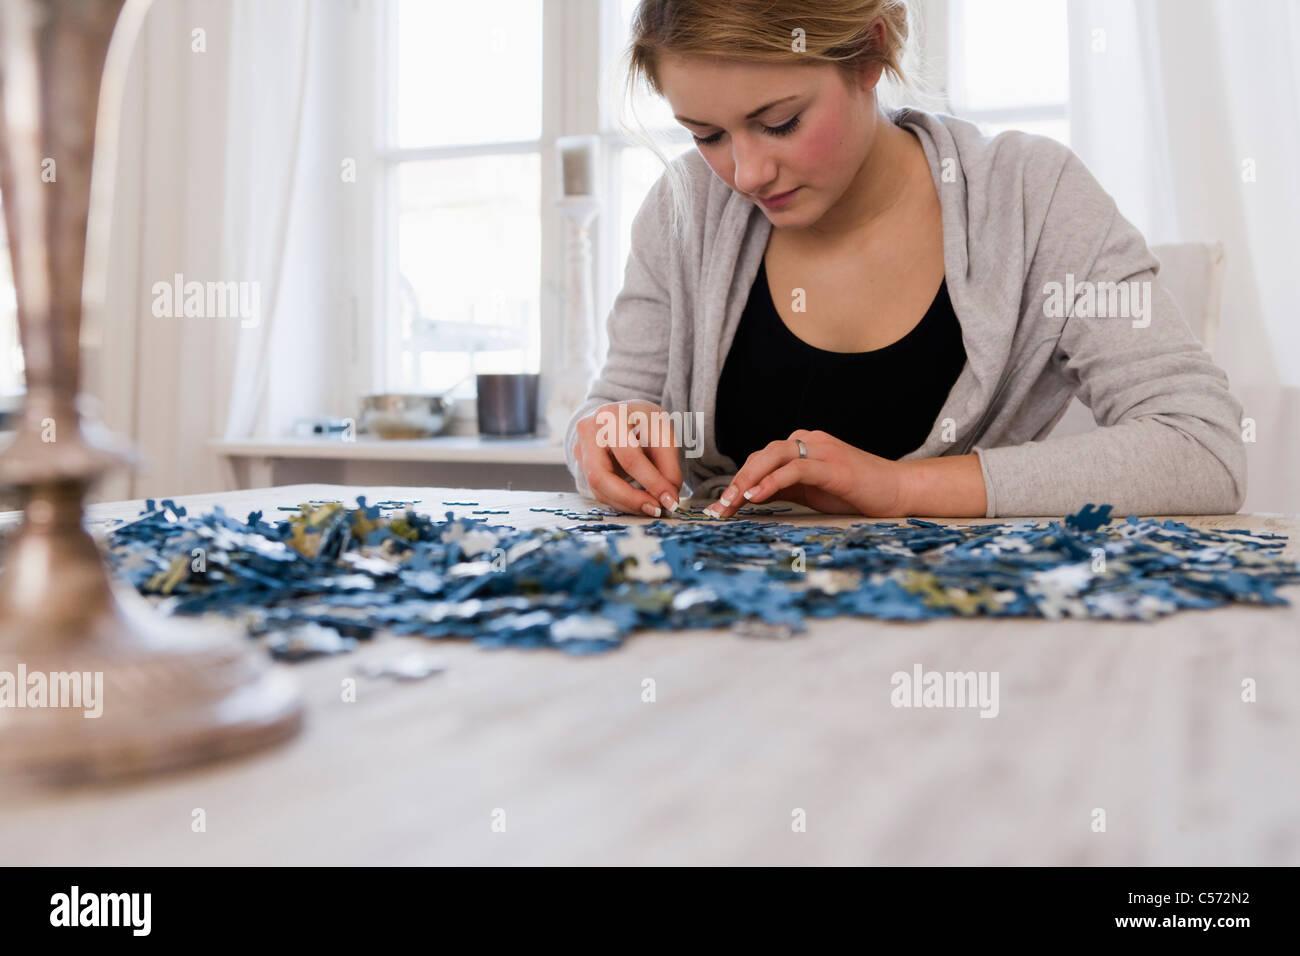 Teenage girl working on jigsaw puzzle - Stock Image